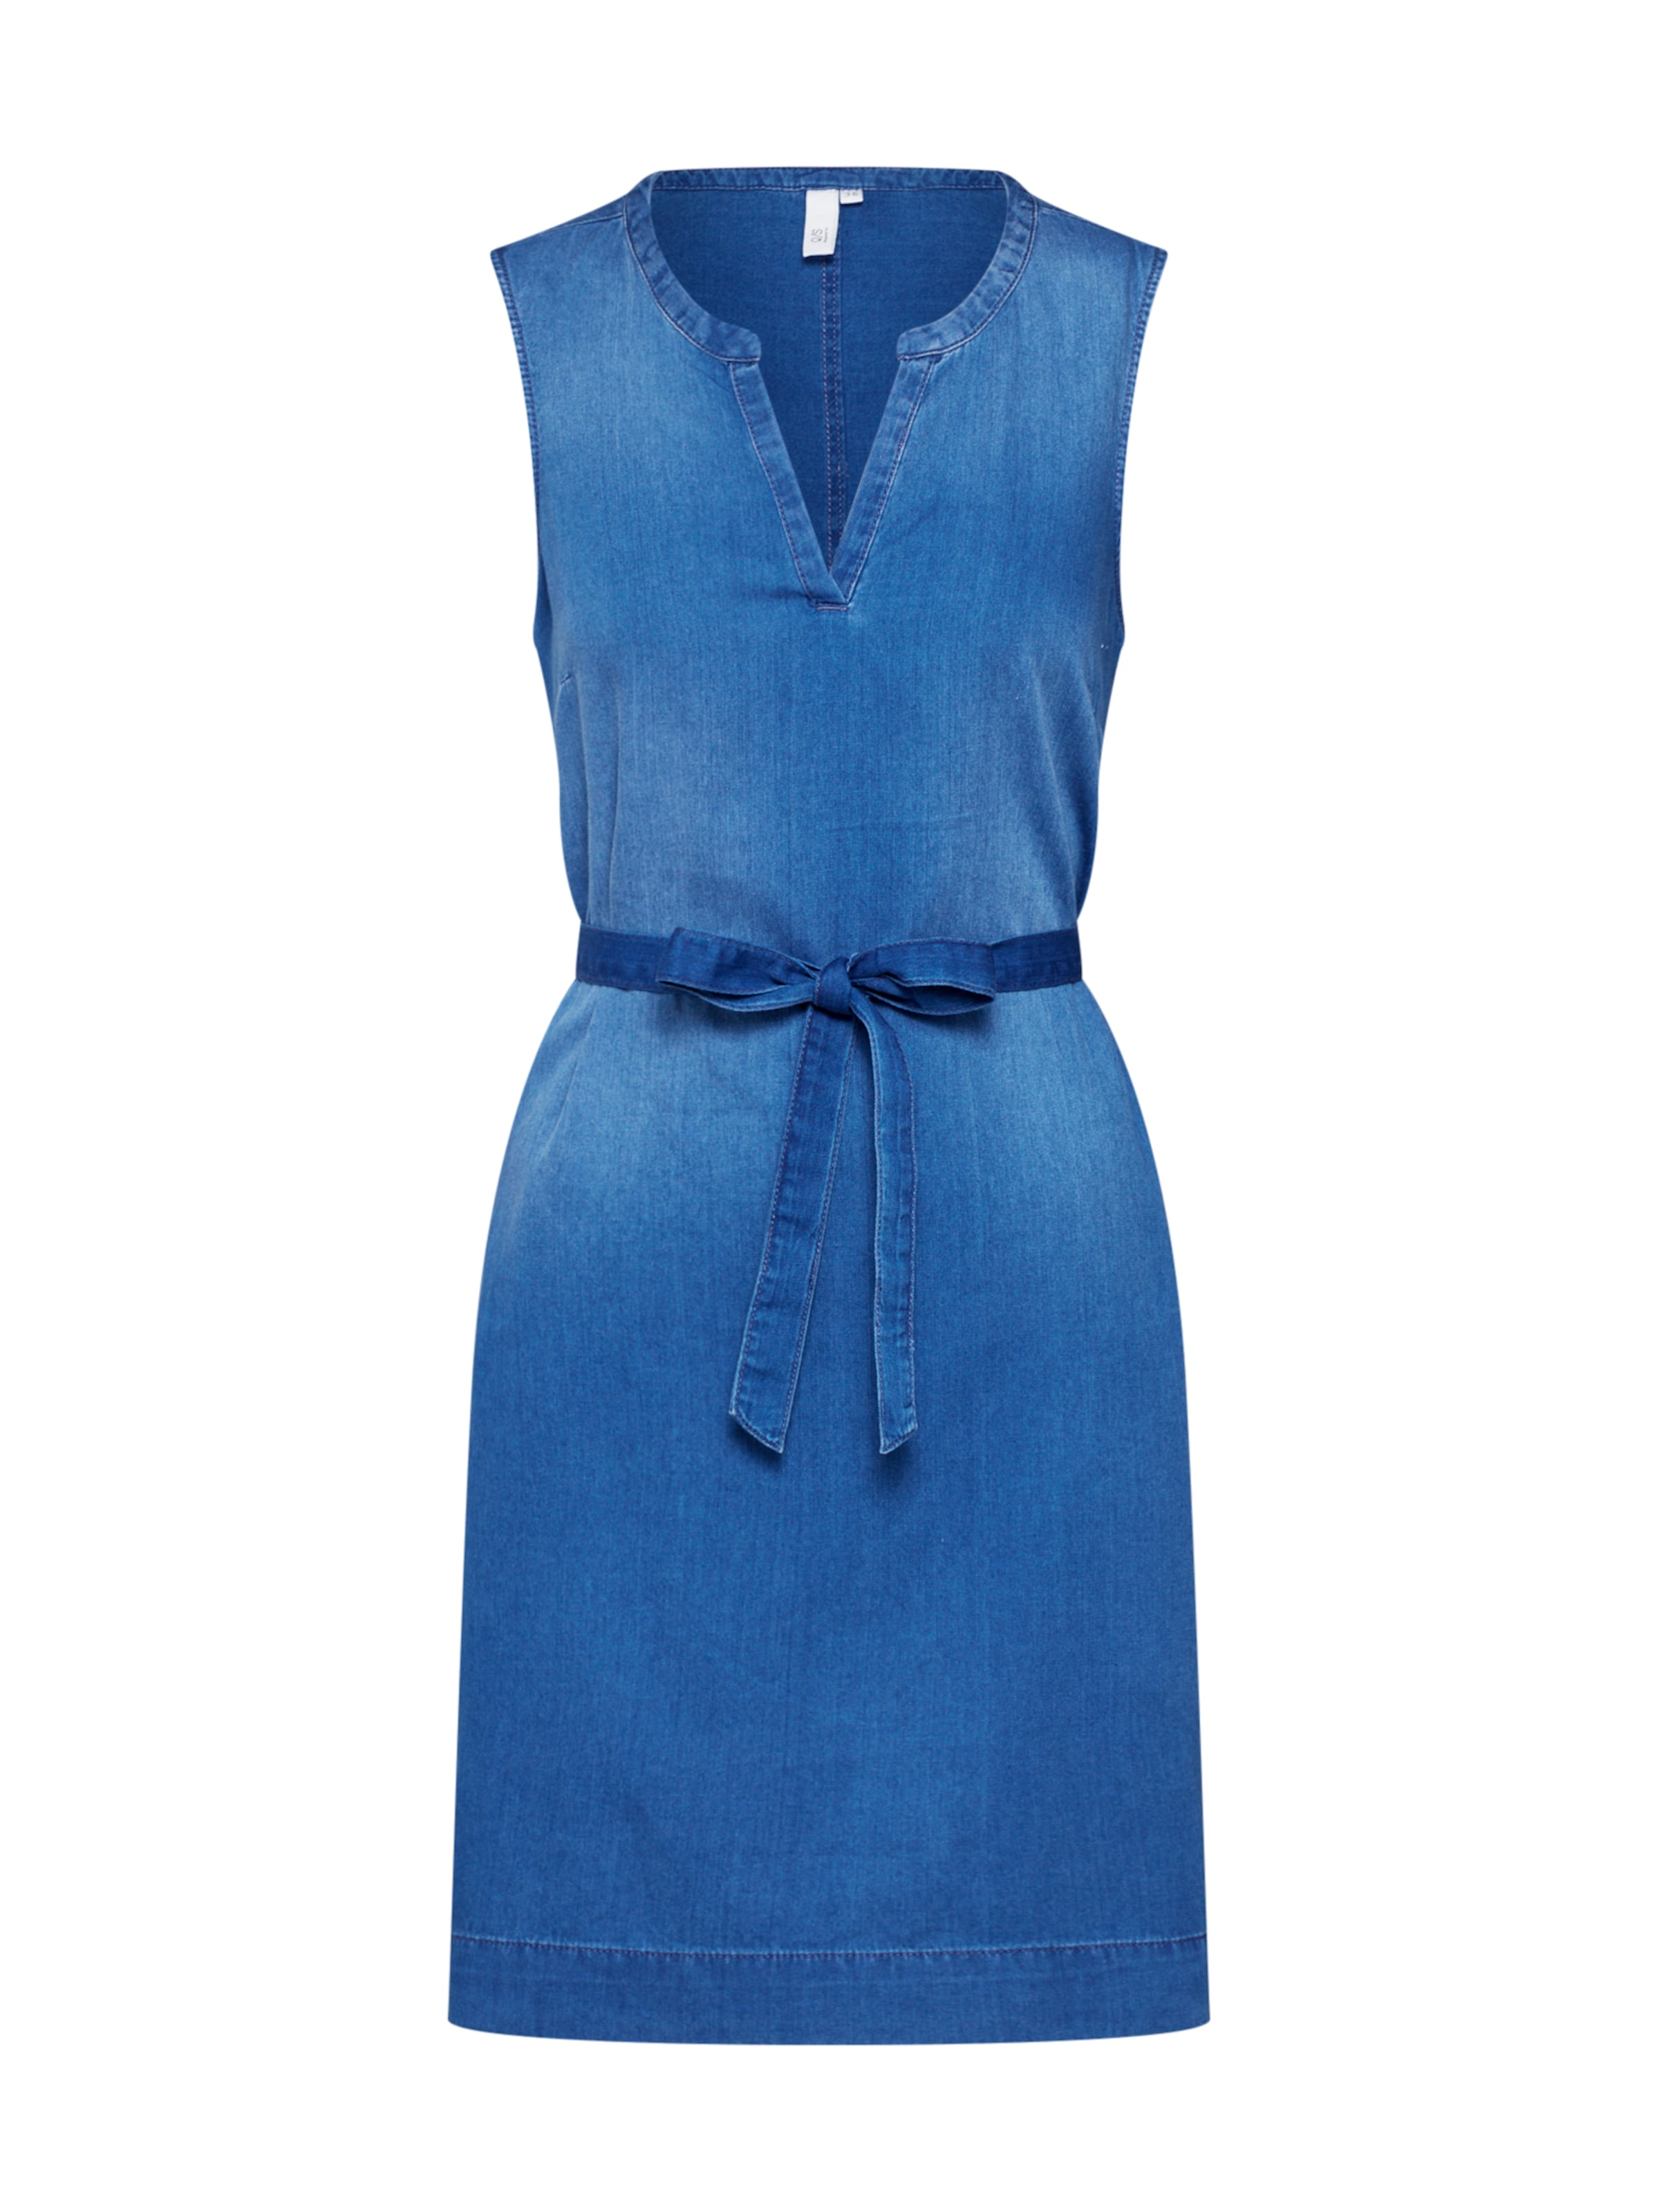 Denim Q Designed By Robe En s Bleu 8nwPONk0X